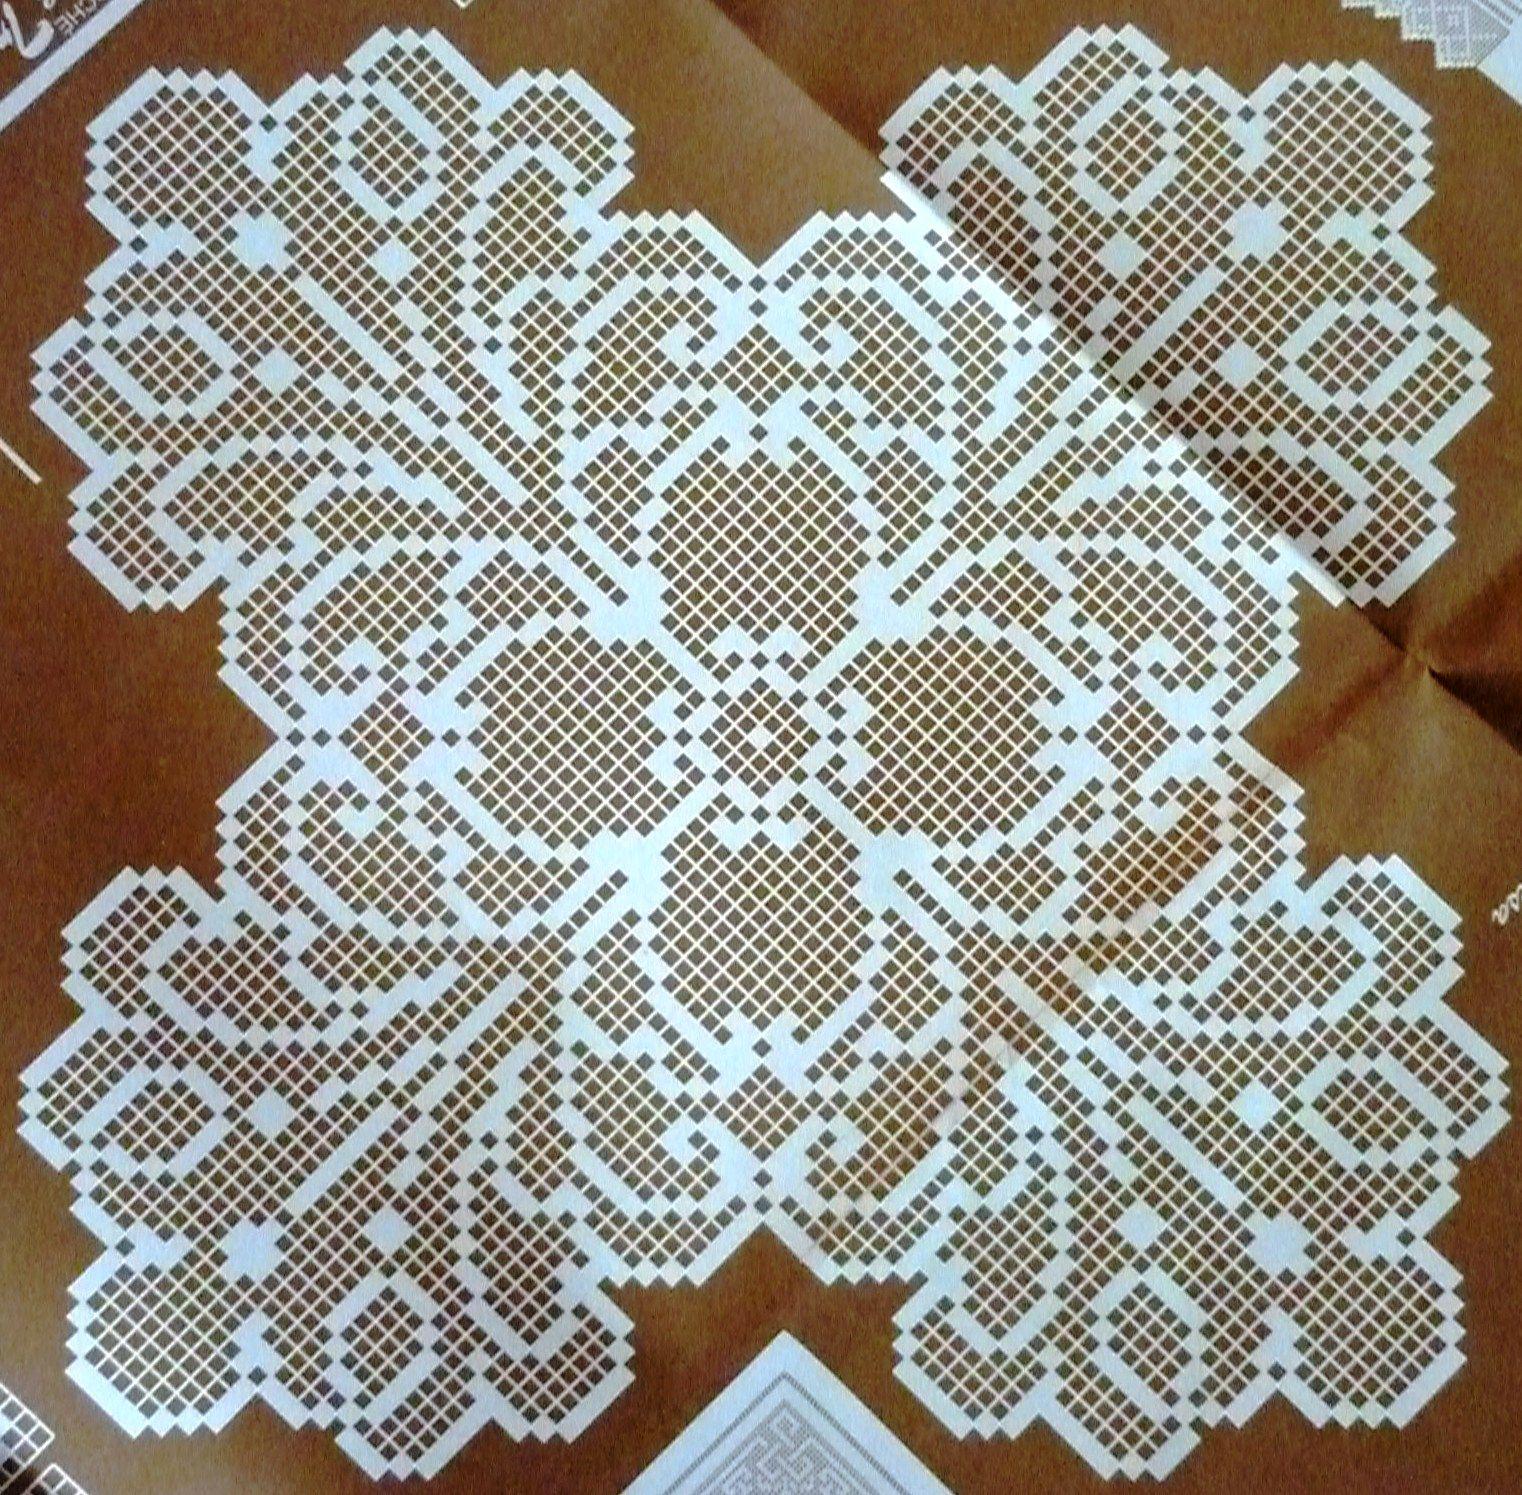 crochet em revista: crochet esquemas | Crochet | Pinterest | Crochet ...